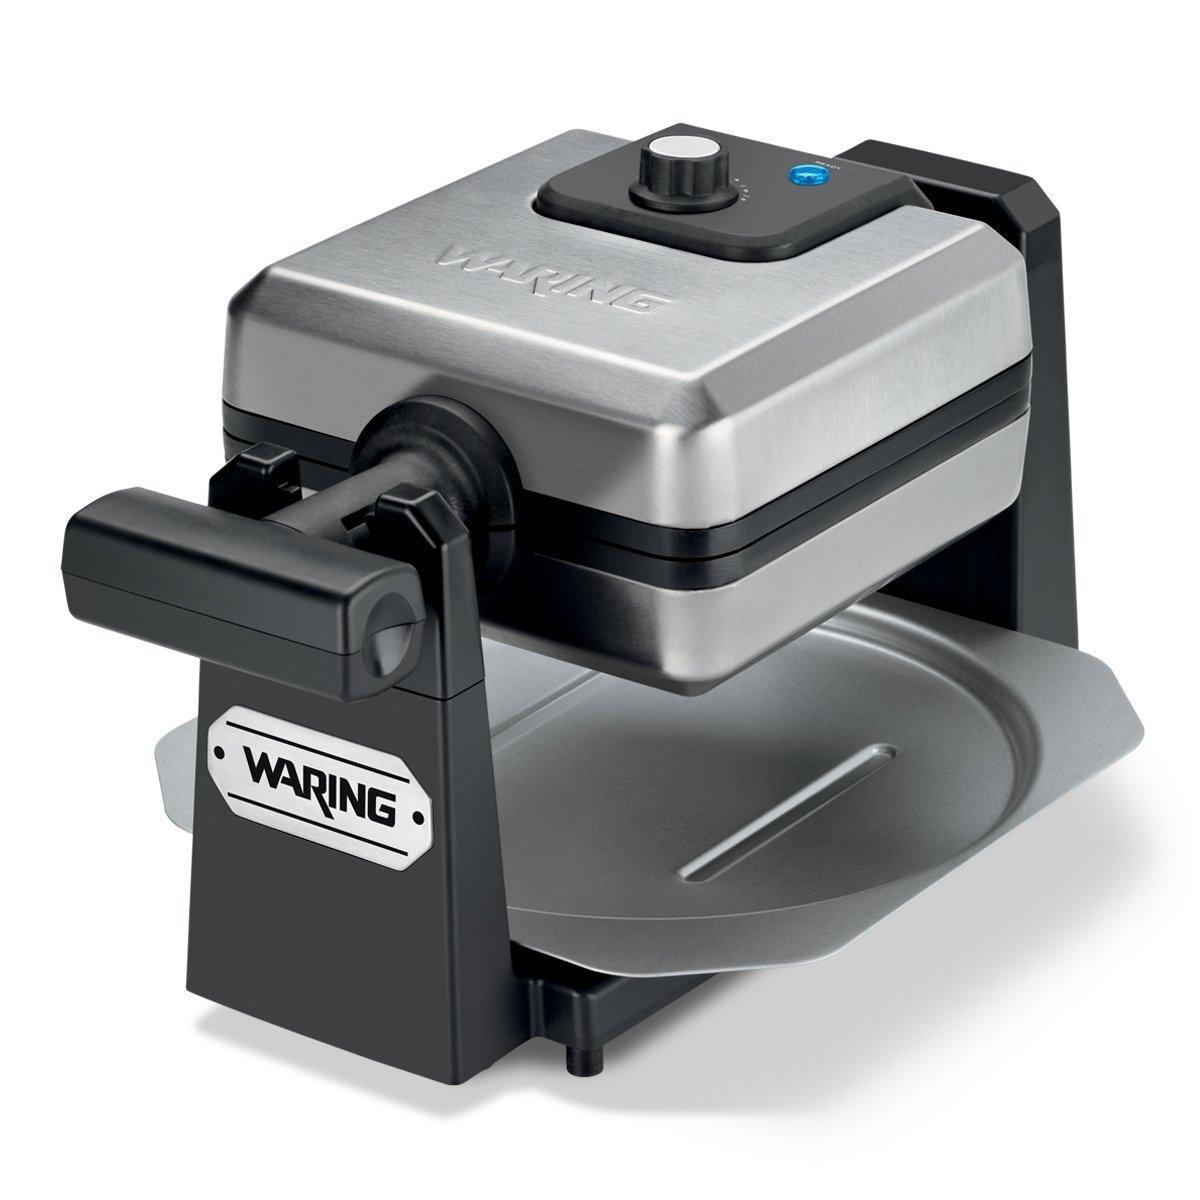 Waring Pro WMK250SQ 4-Slice Belgian Waffle Maker, Stainless Steel/Black (CERTIFIED REFURBISHED)